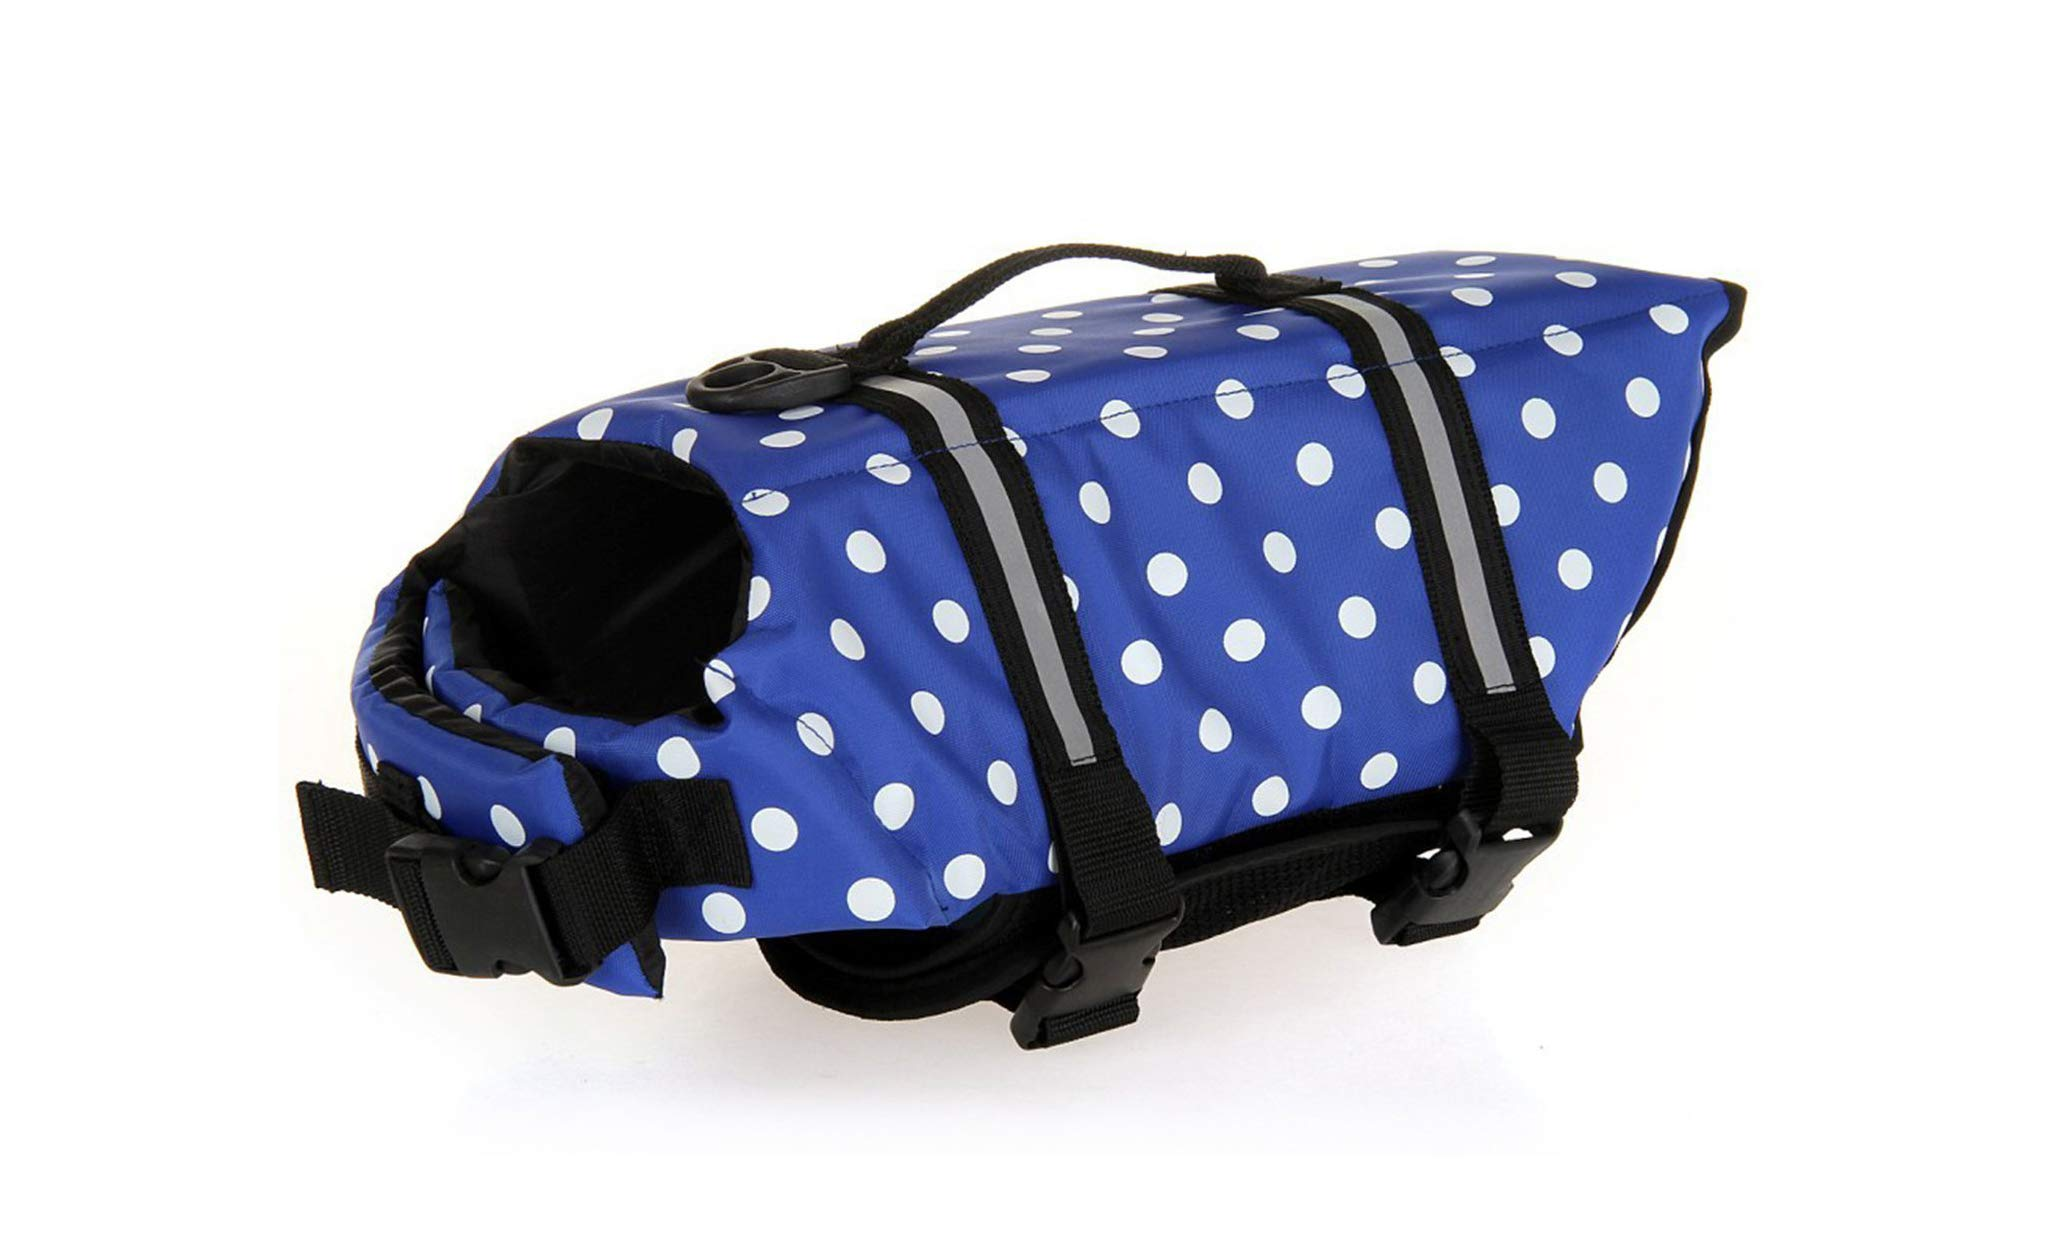 GabeFish Dog Life Jacket Vest Safety Clothes Collar Harness Saver Pet Swimming Preserver Reflective Strip Swimwear